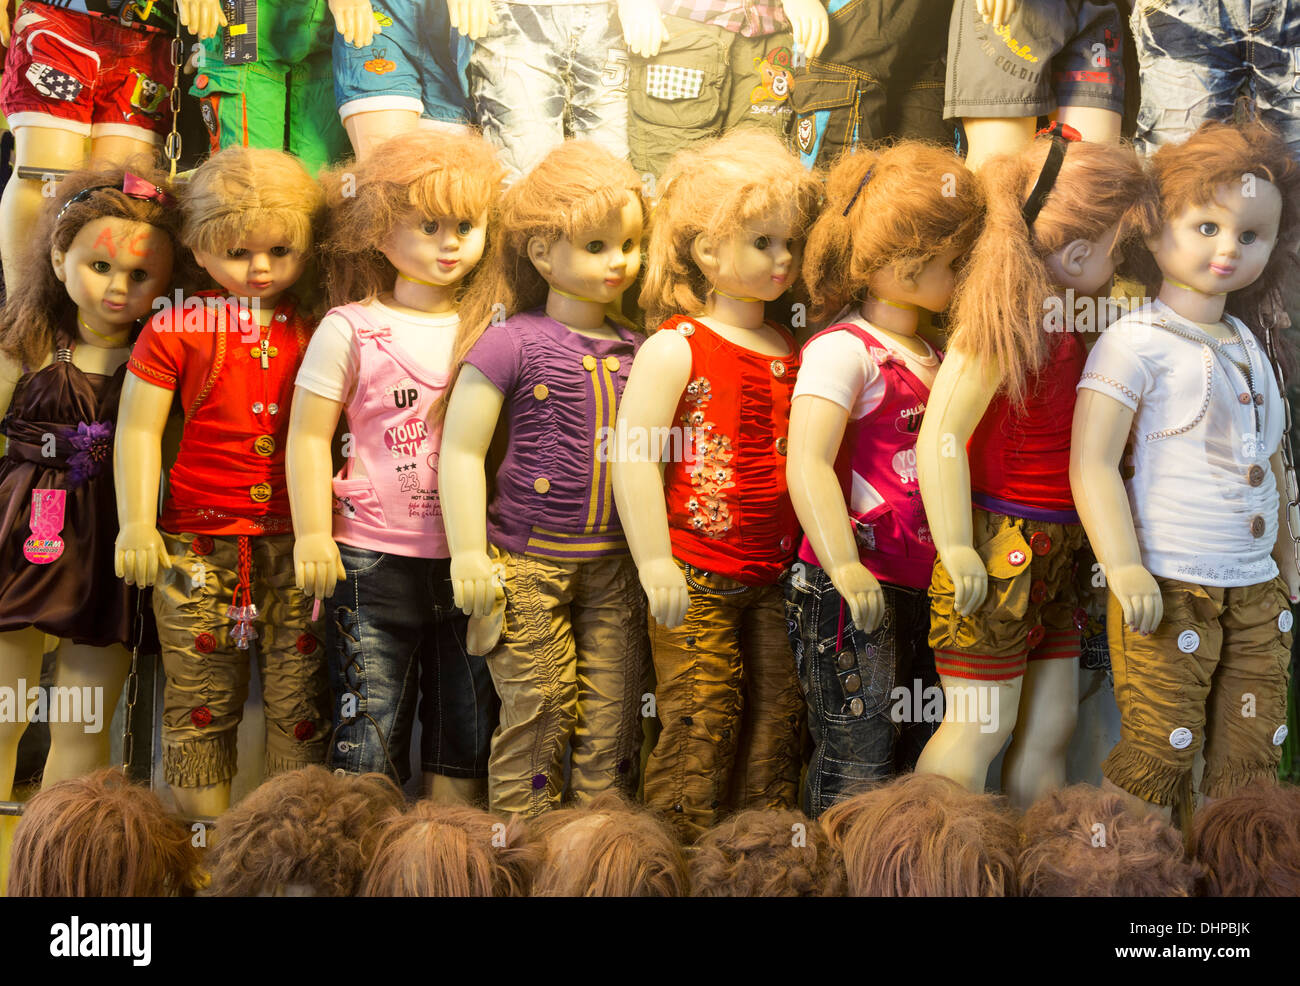 219a90a19e5c Persian Clothes Stock Photos   Persian Clothes Stock Images - Alamy